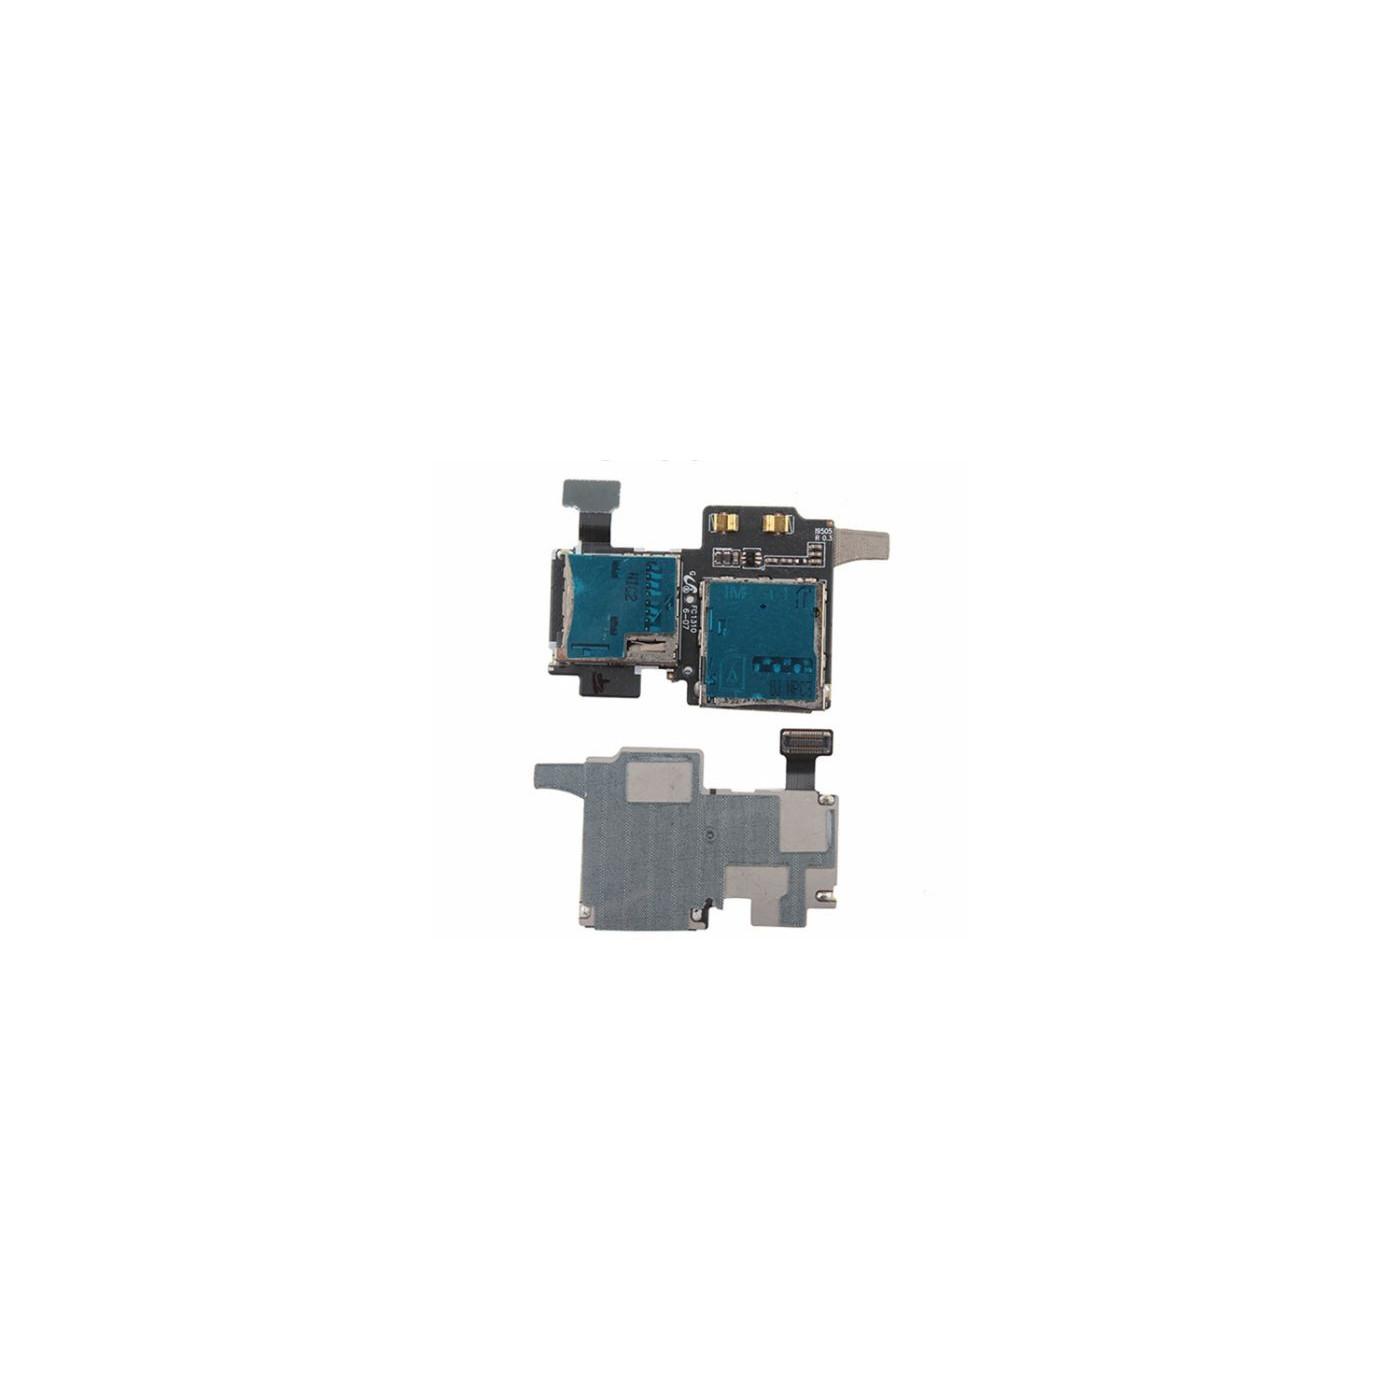 Flex flat card reader SIM card and Micro SD slot for samsung galaxy s4 gt-i9505